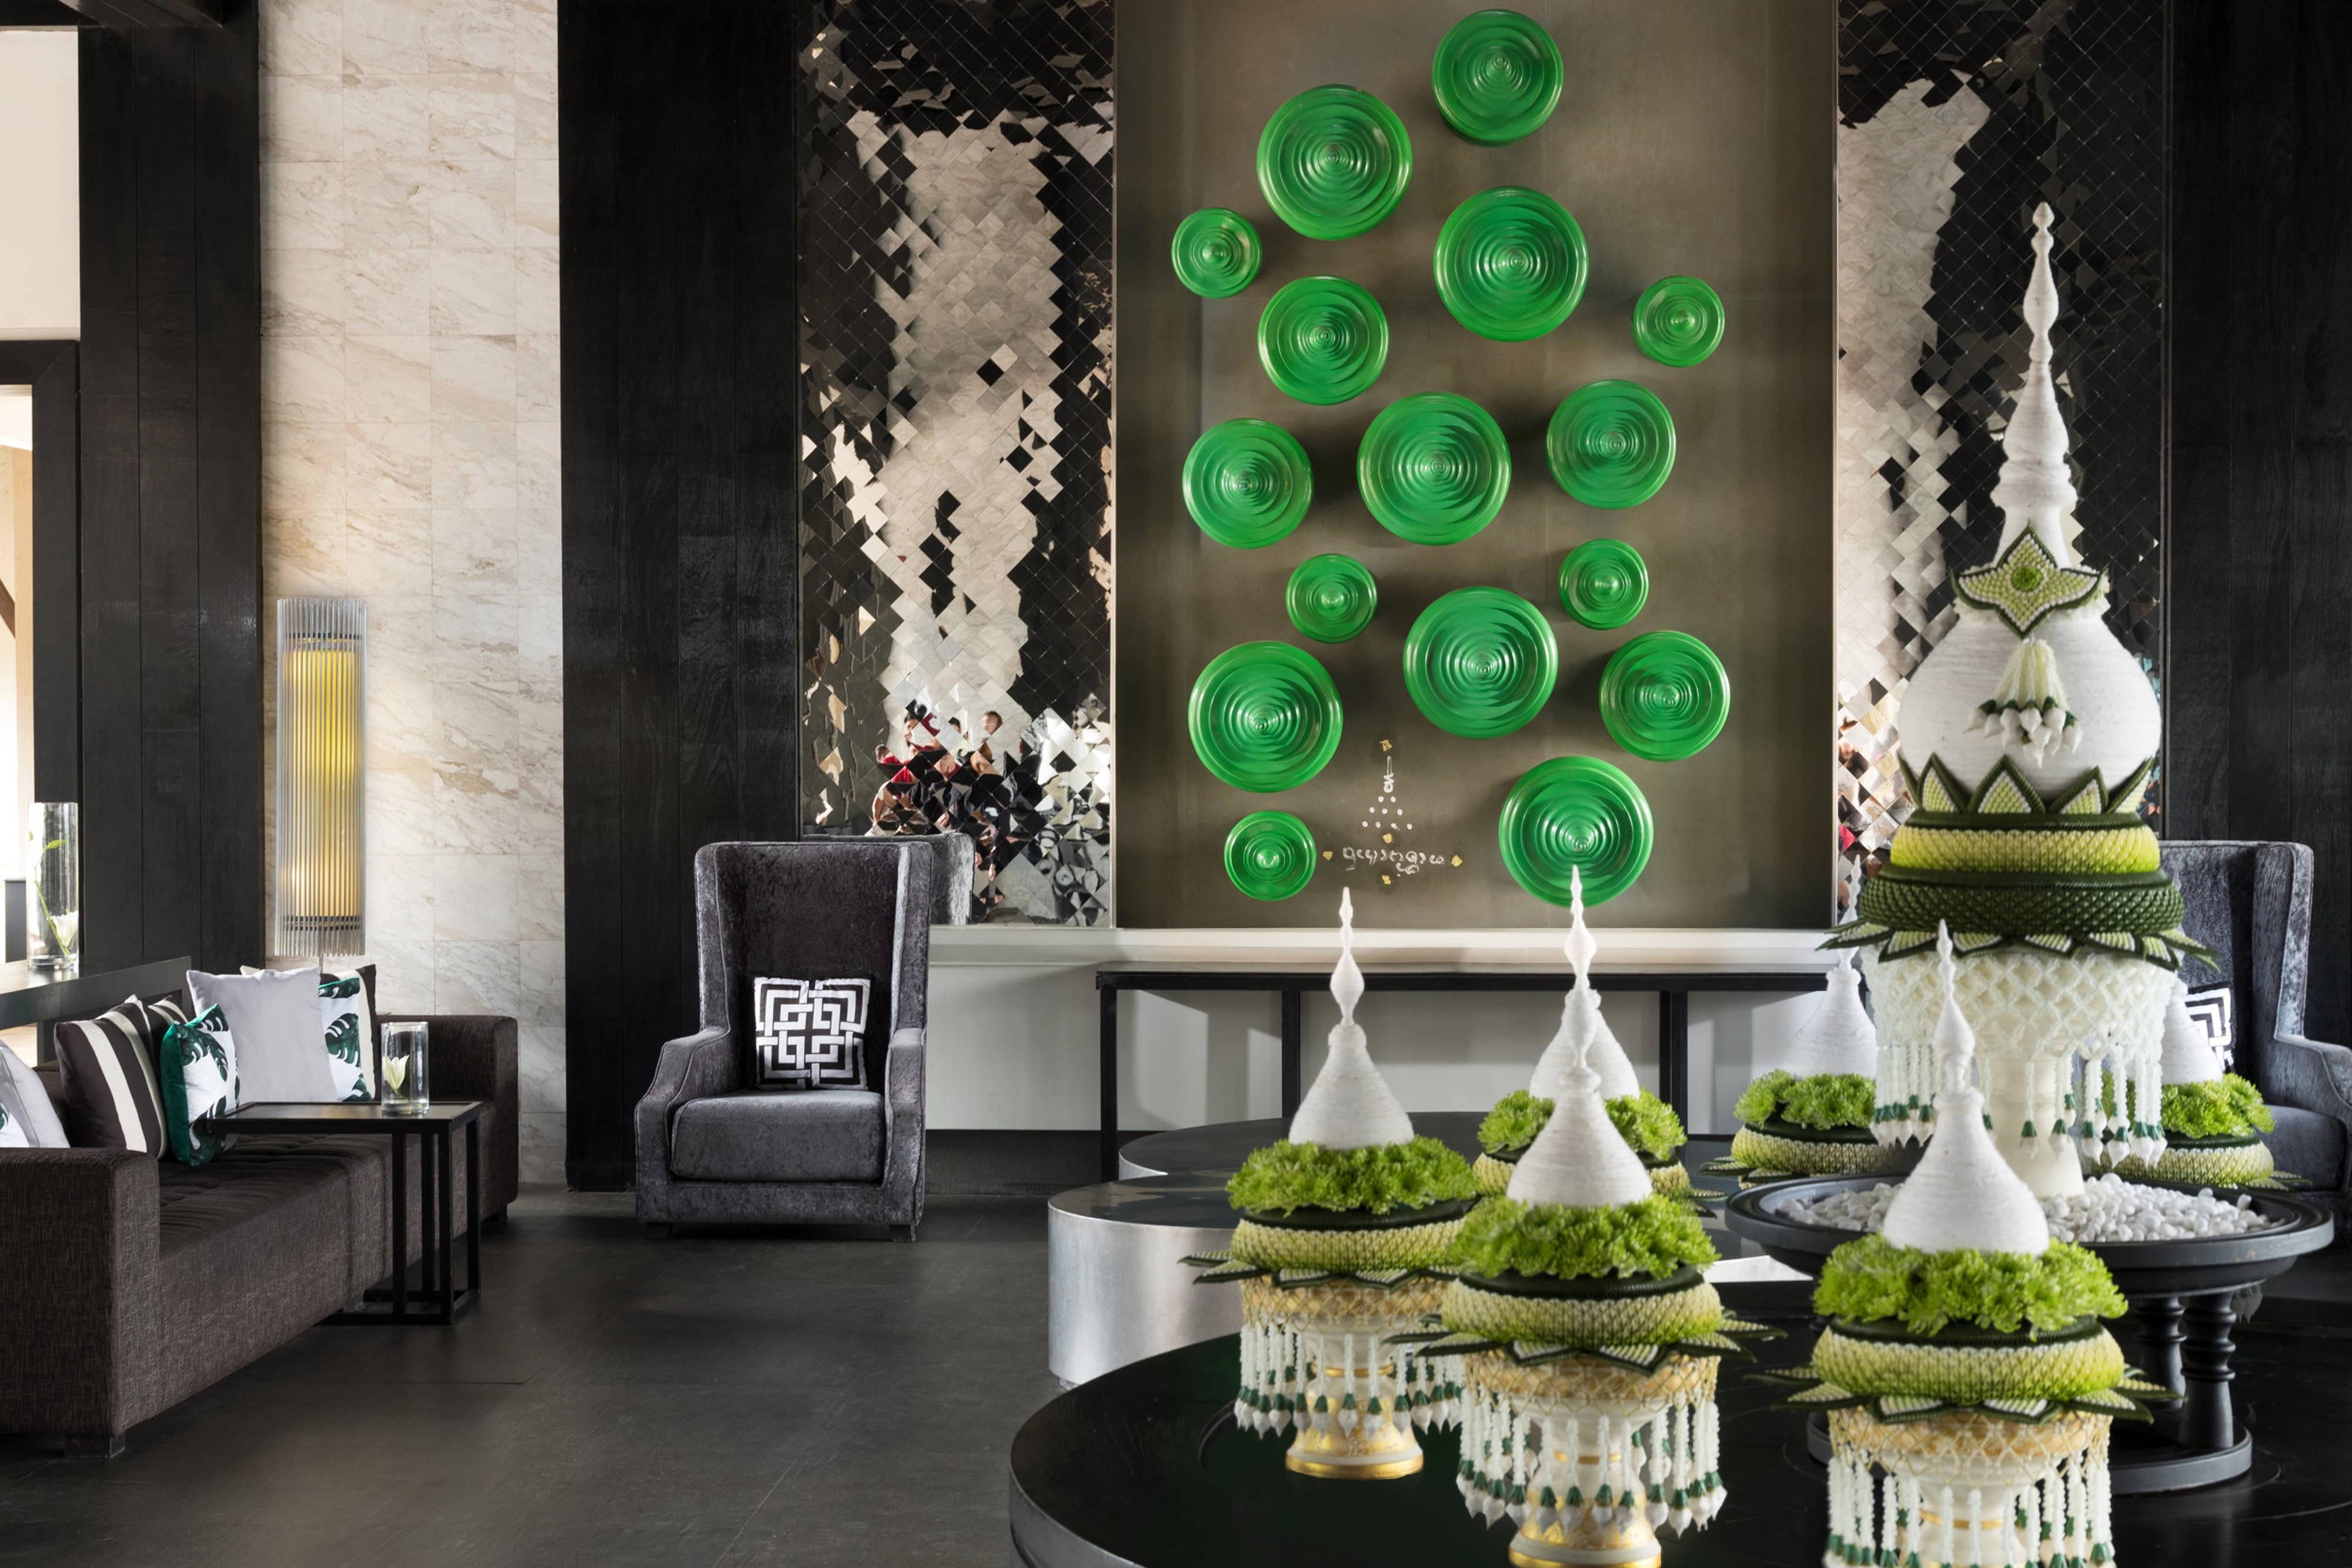 Hotel Lobby Ceremonial Monk Bowls